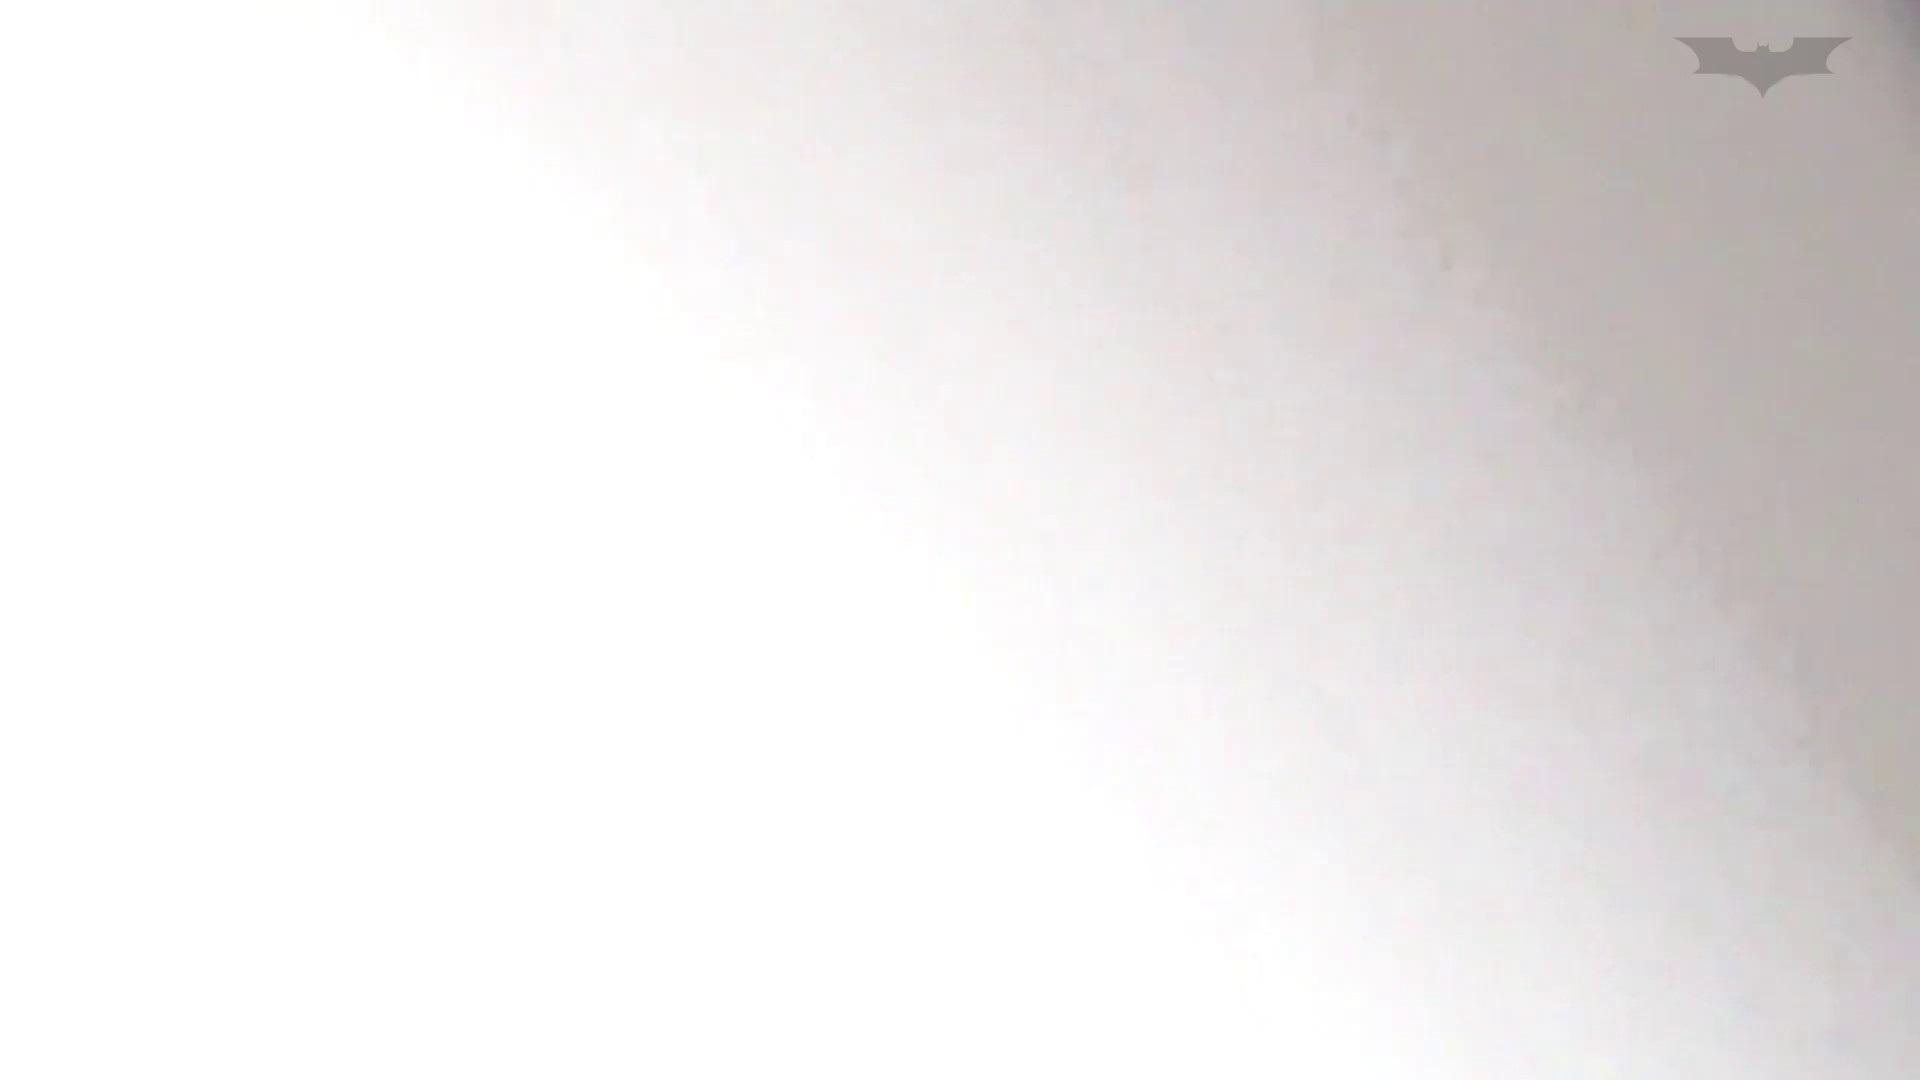 JD盗撮 美女の洗面所の秘密 Vol.47 美肌 エロ無料画像 108画像 31